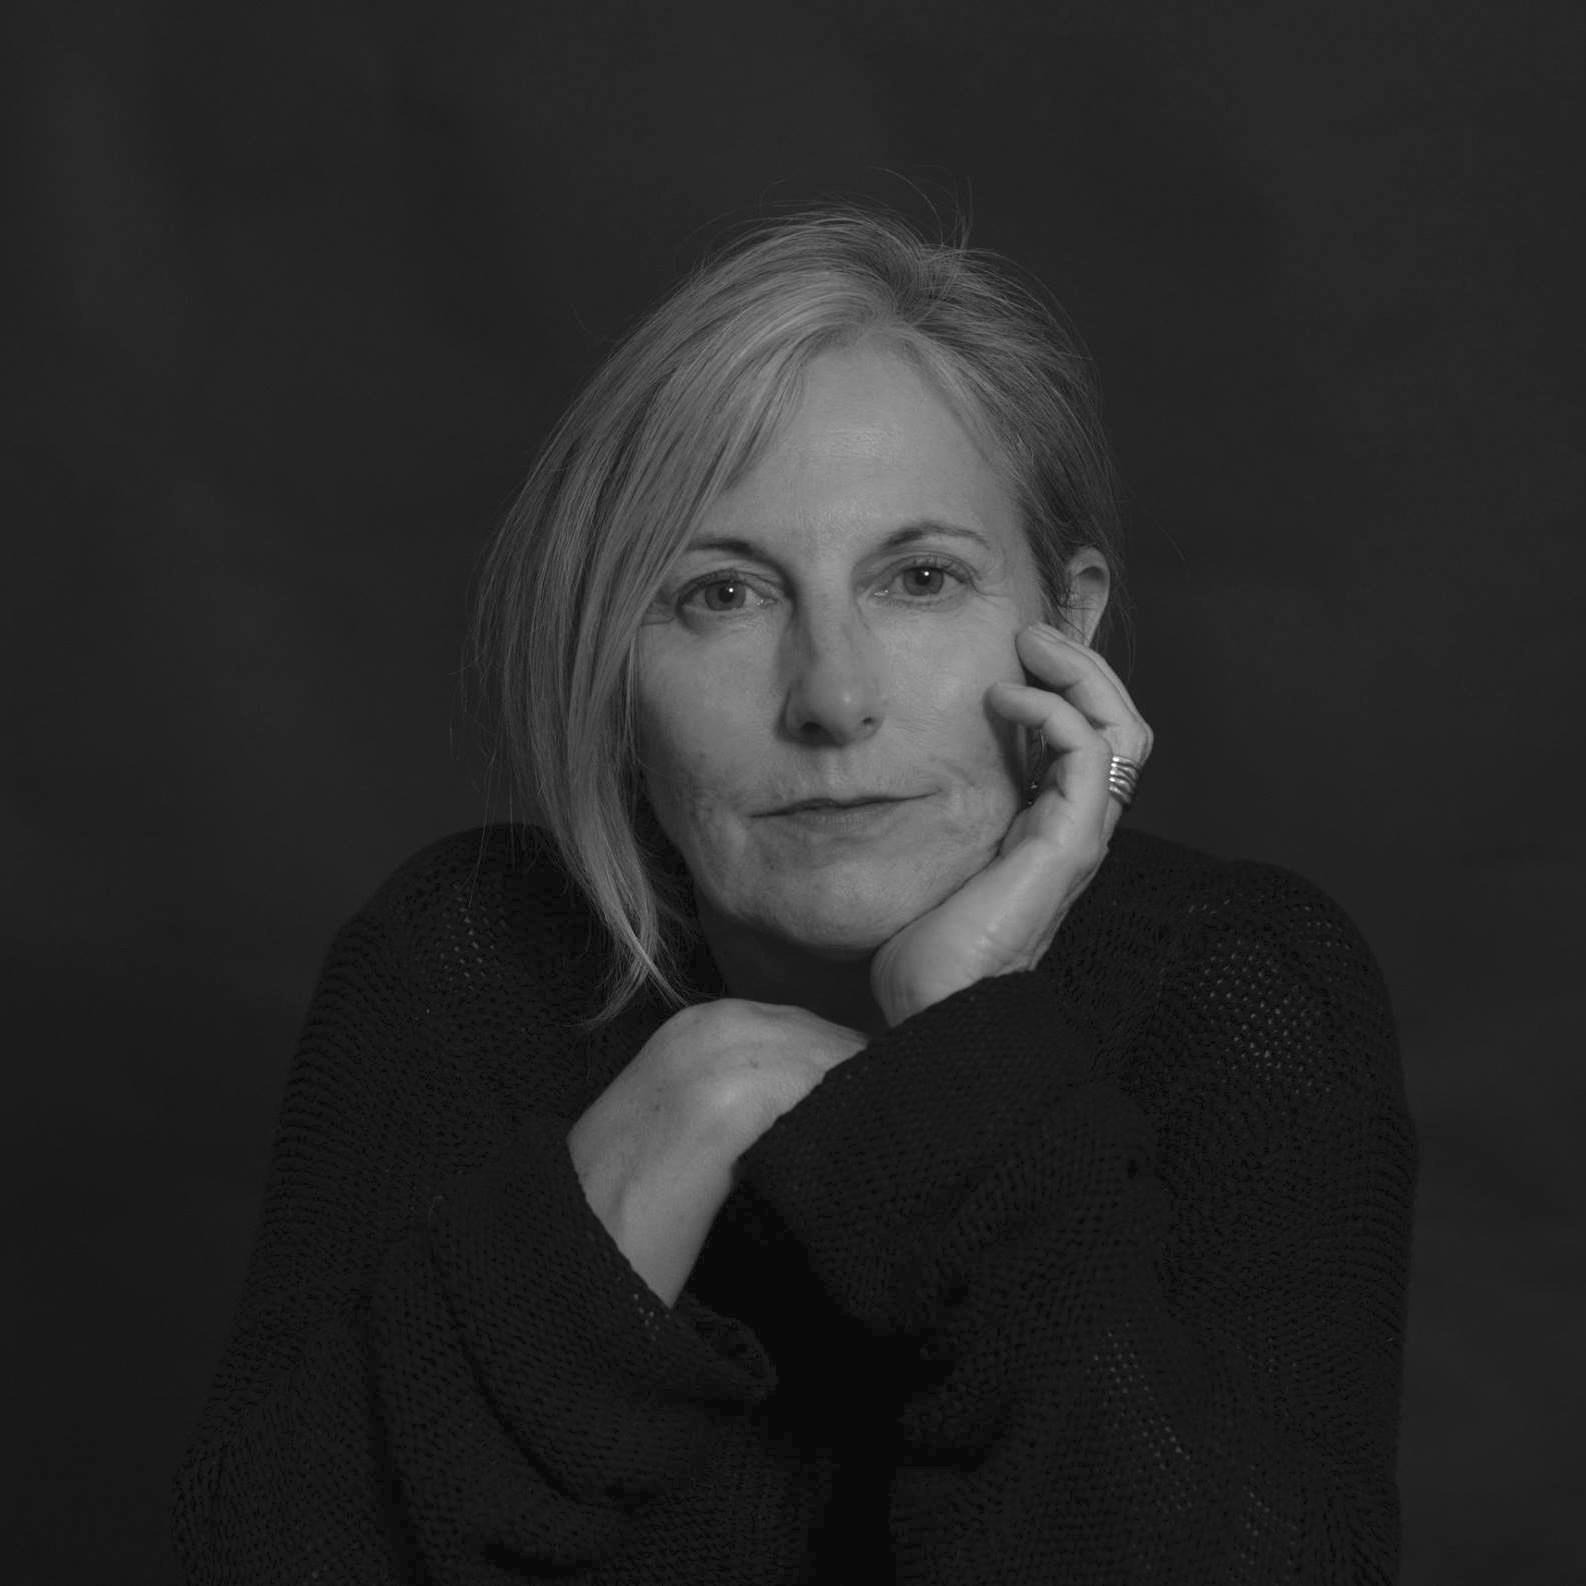 Claire Gordon - Professional Photographer,